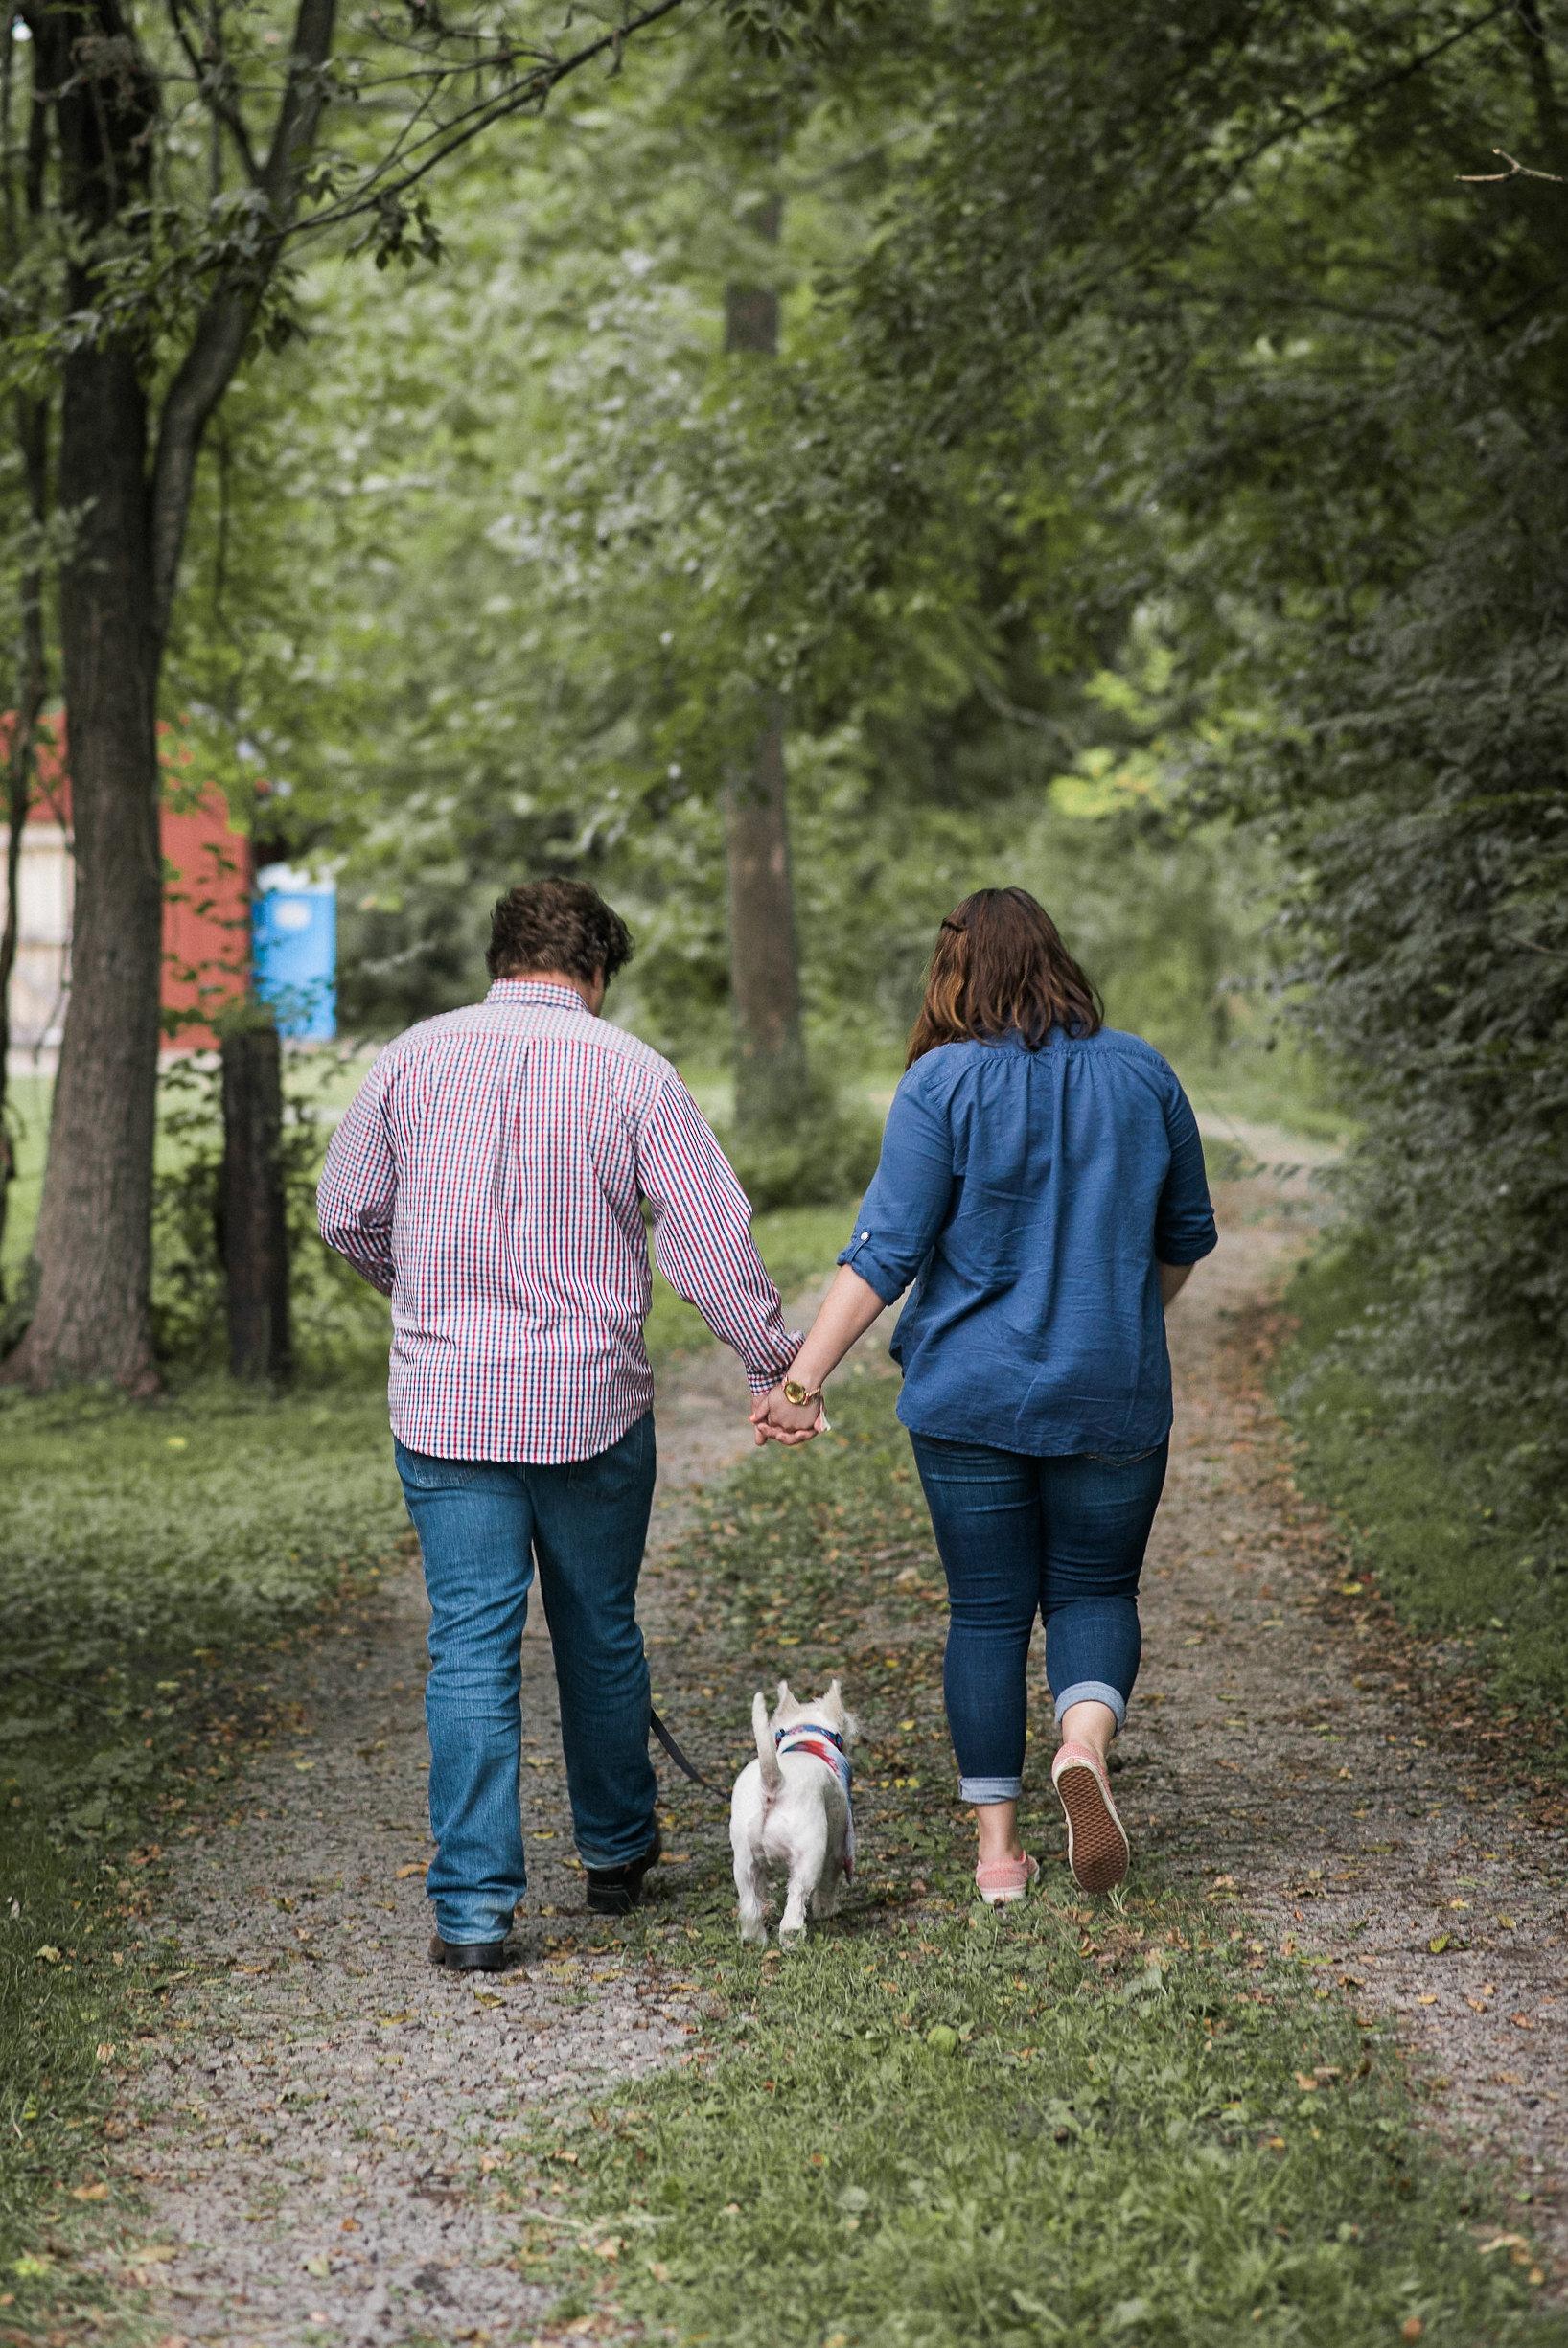 Couple walking away with dog